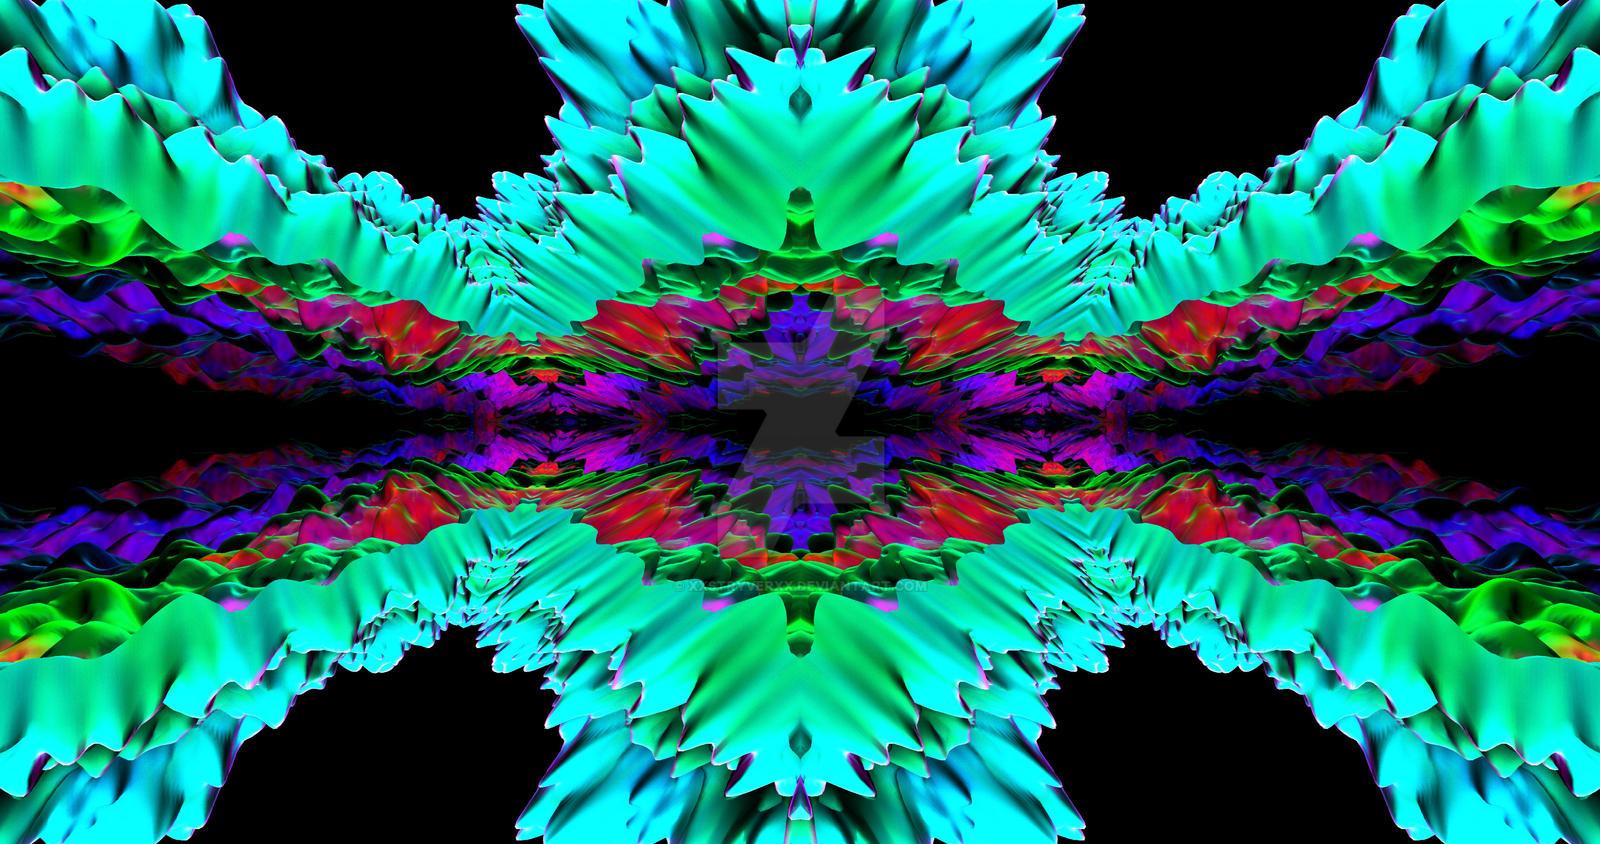 4th Dimension 4K Rainbow Wallpaper by XxStryveRxX